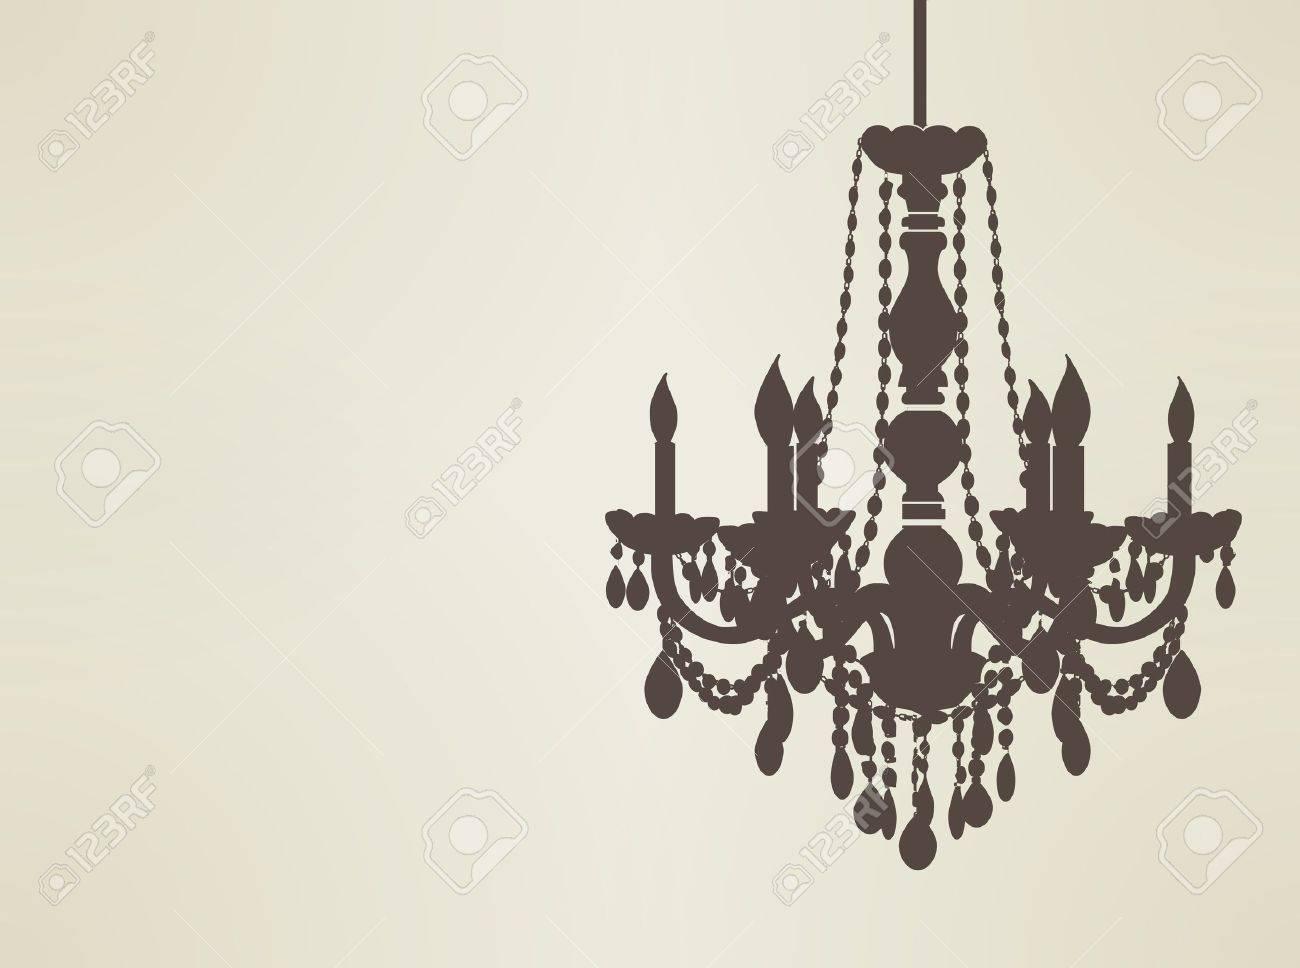 chandelier silhouette Stock Vector - 19977805